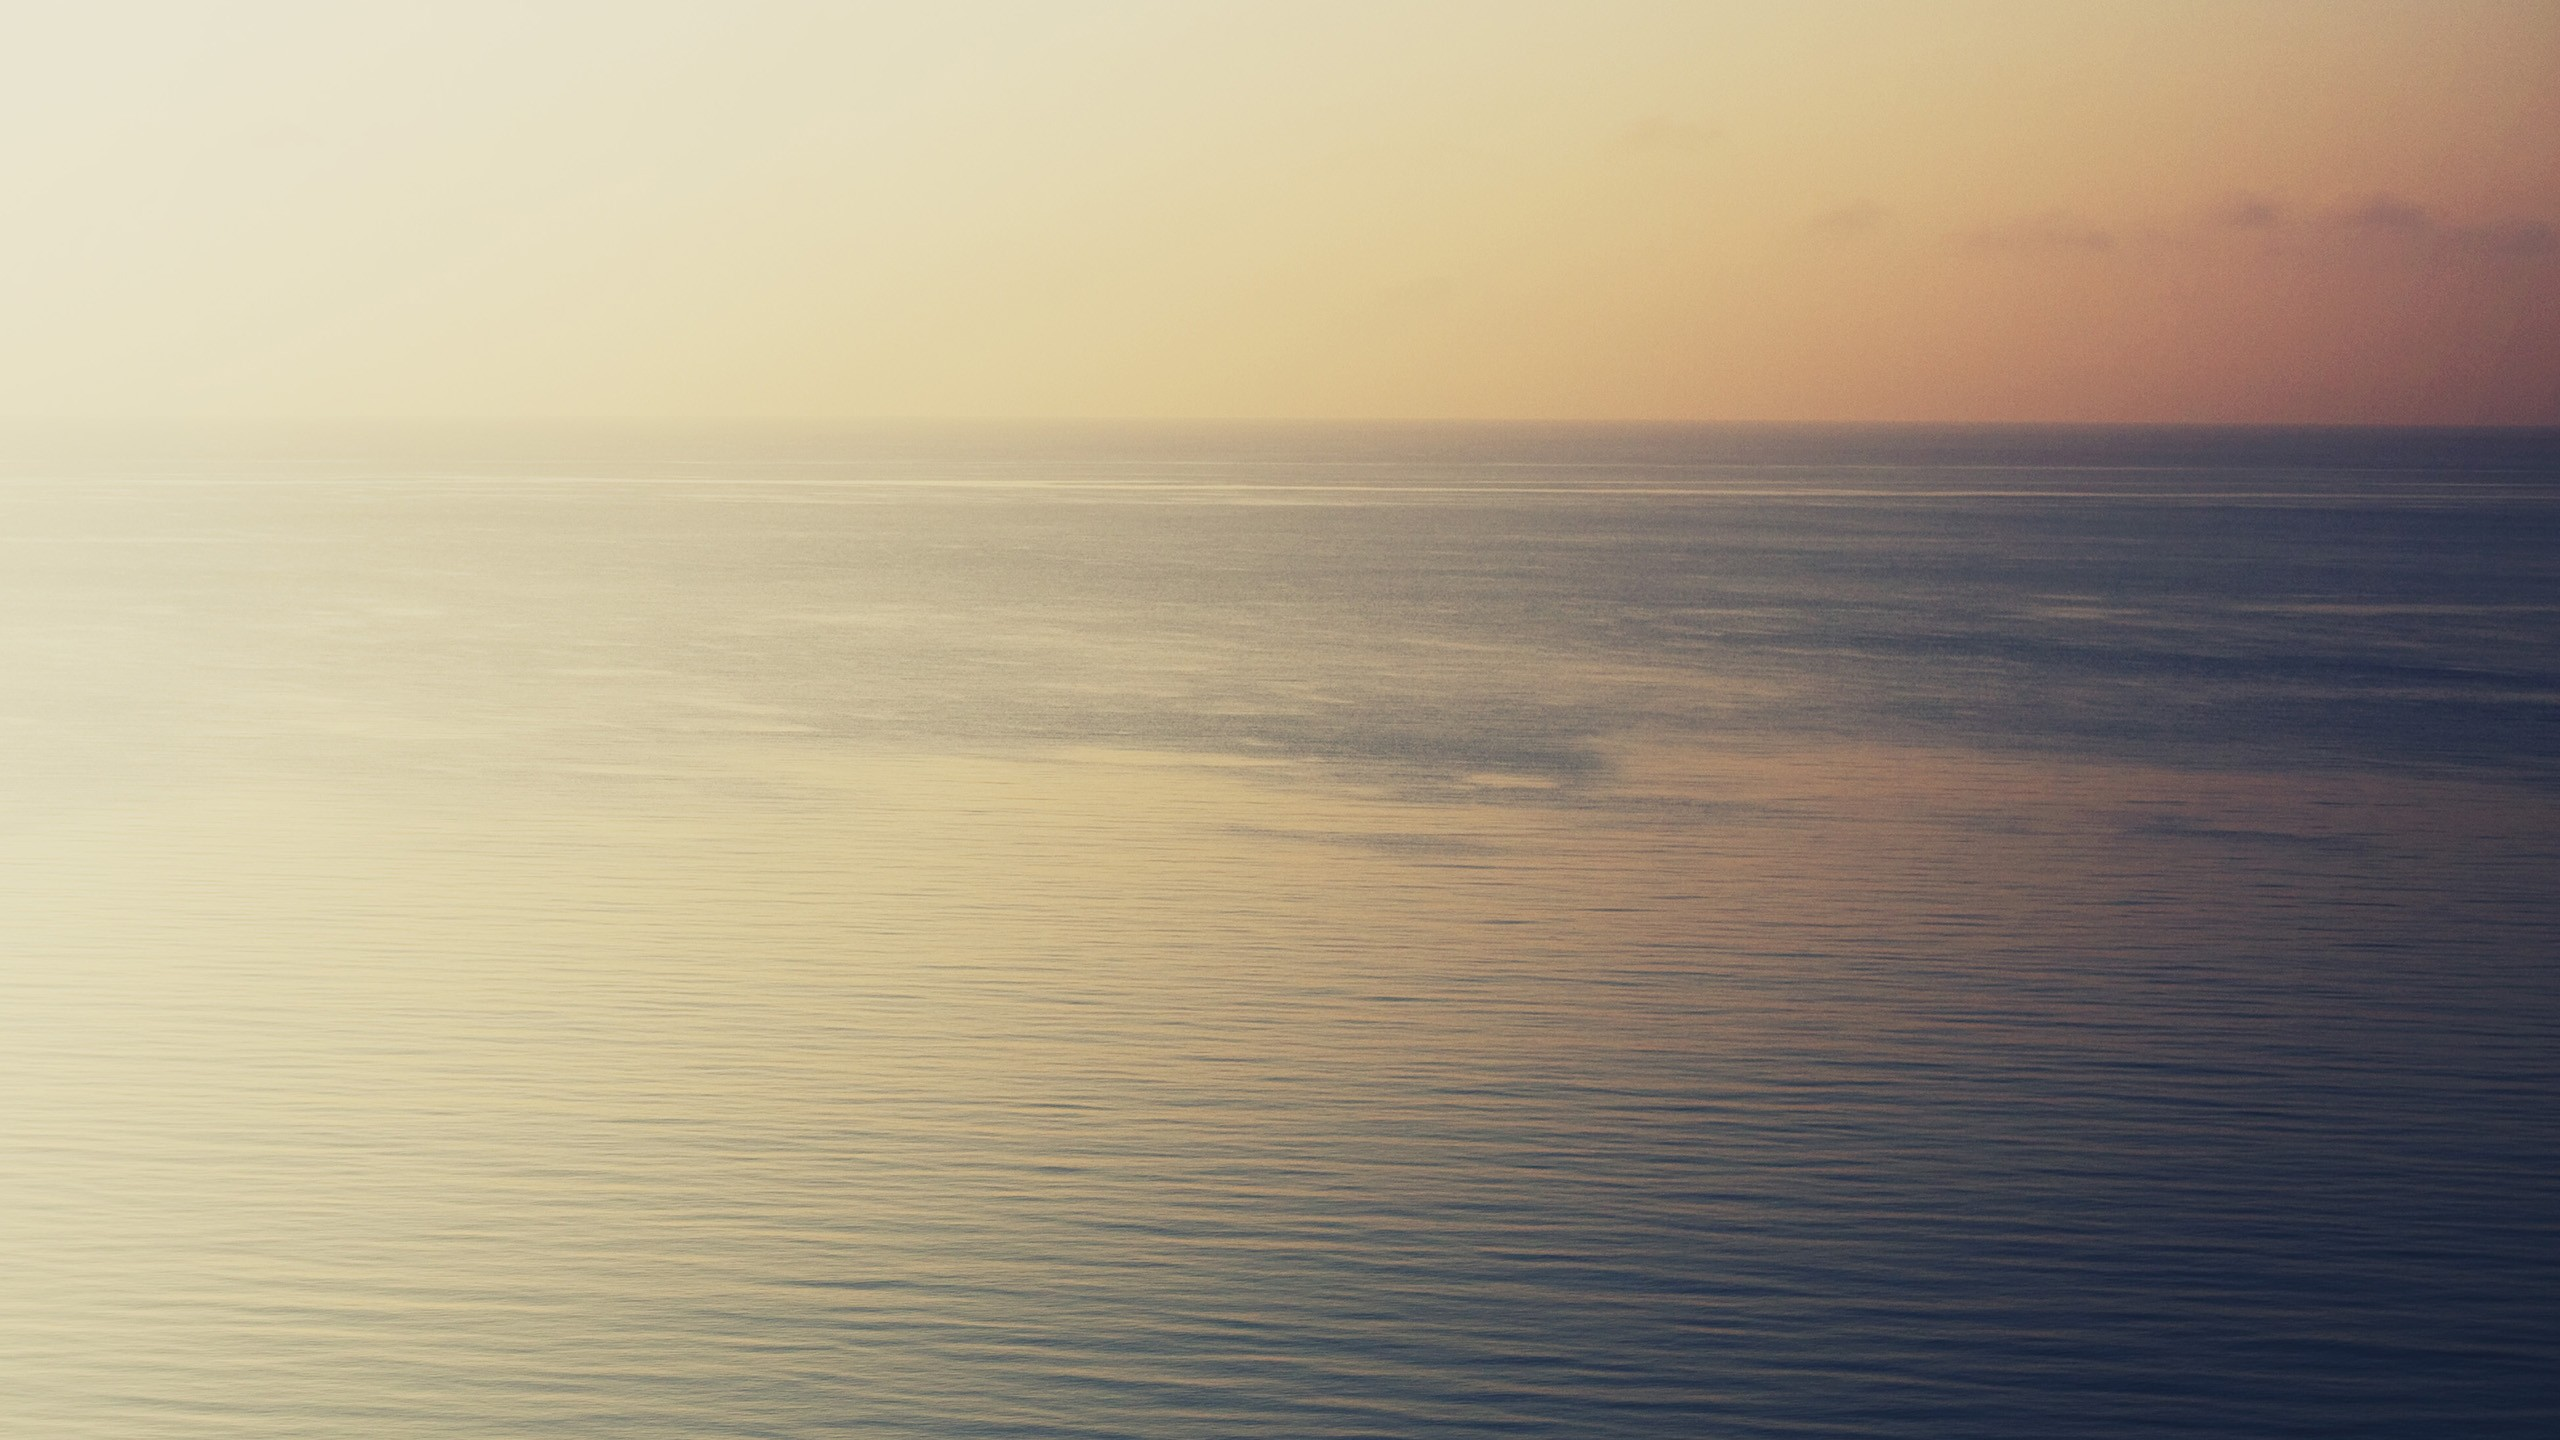 Sea Minimalism Wallpapers